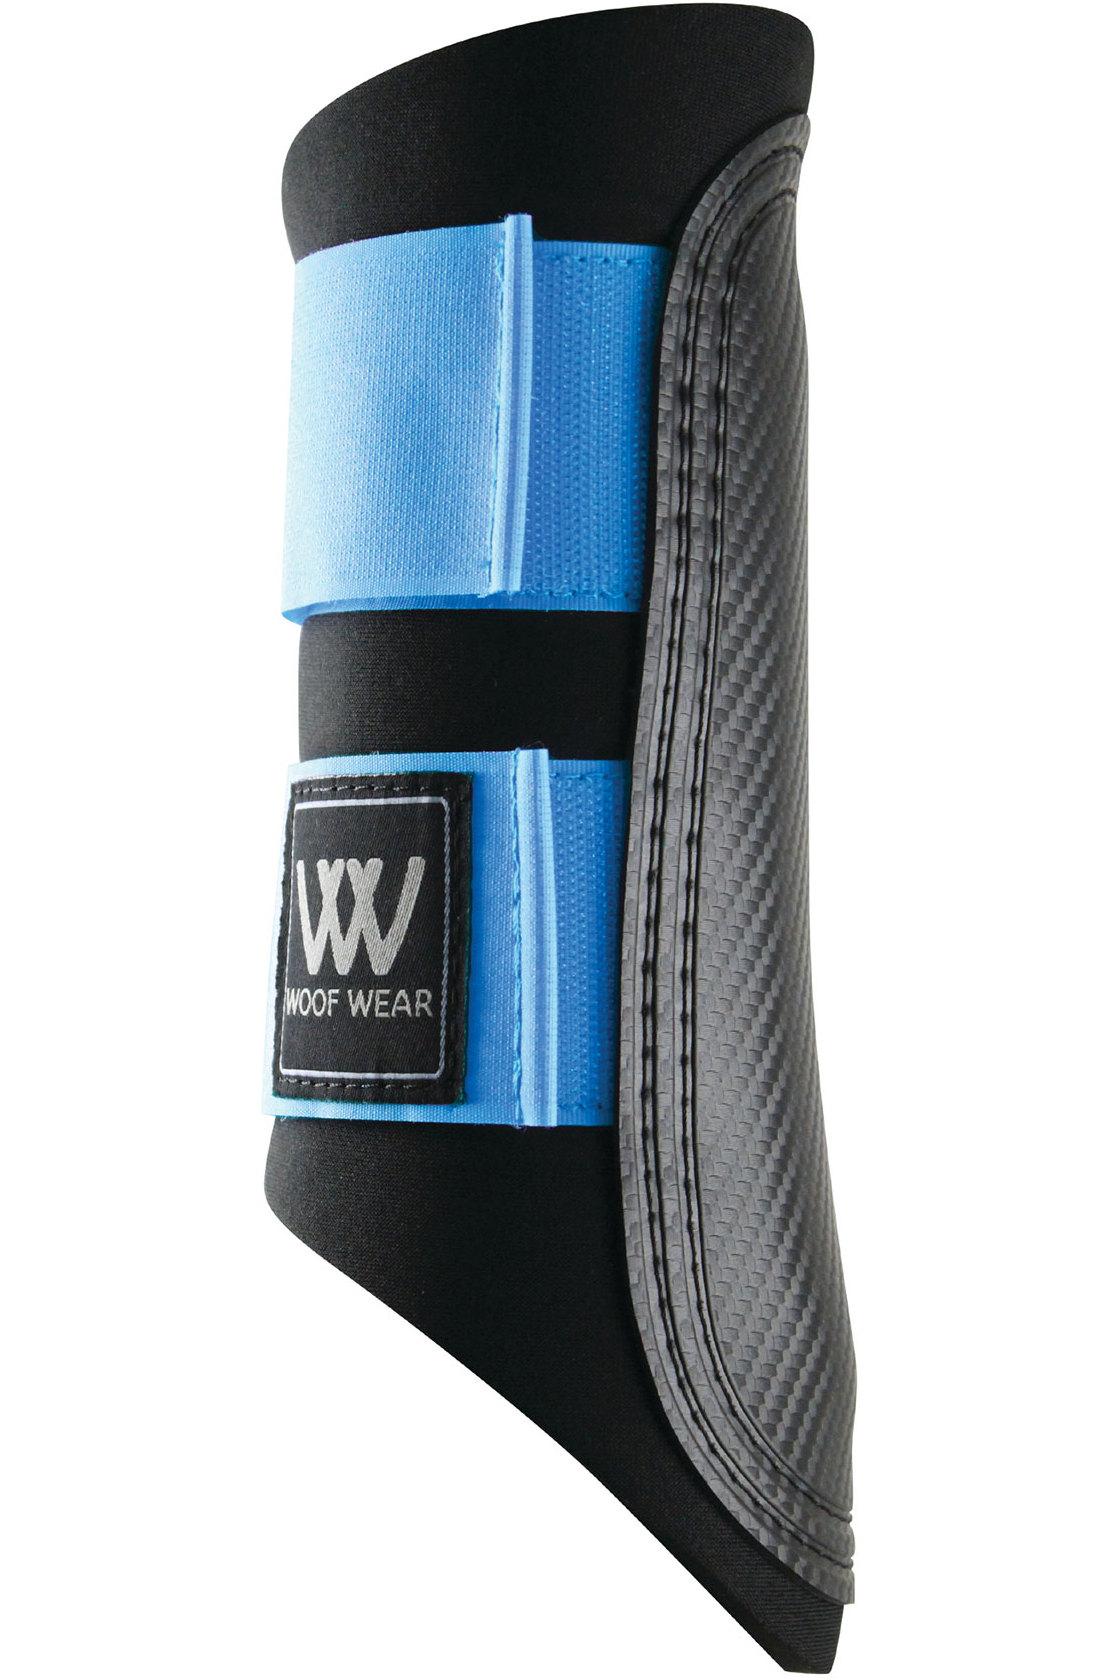 Woof Wear Club Brushing Boot - Powder